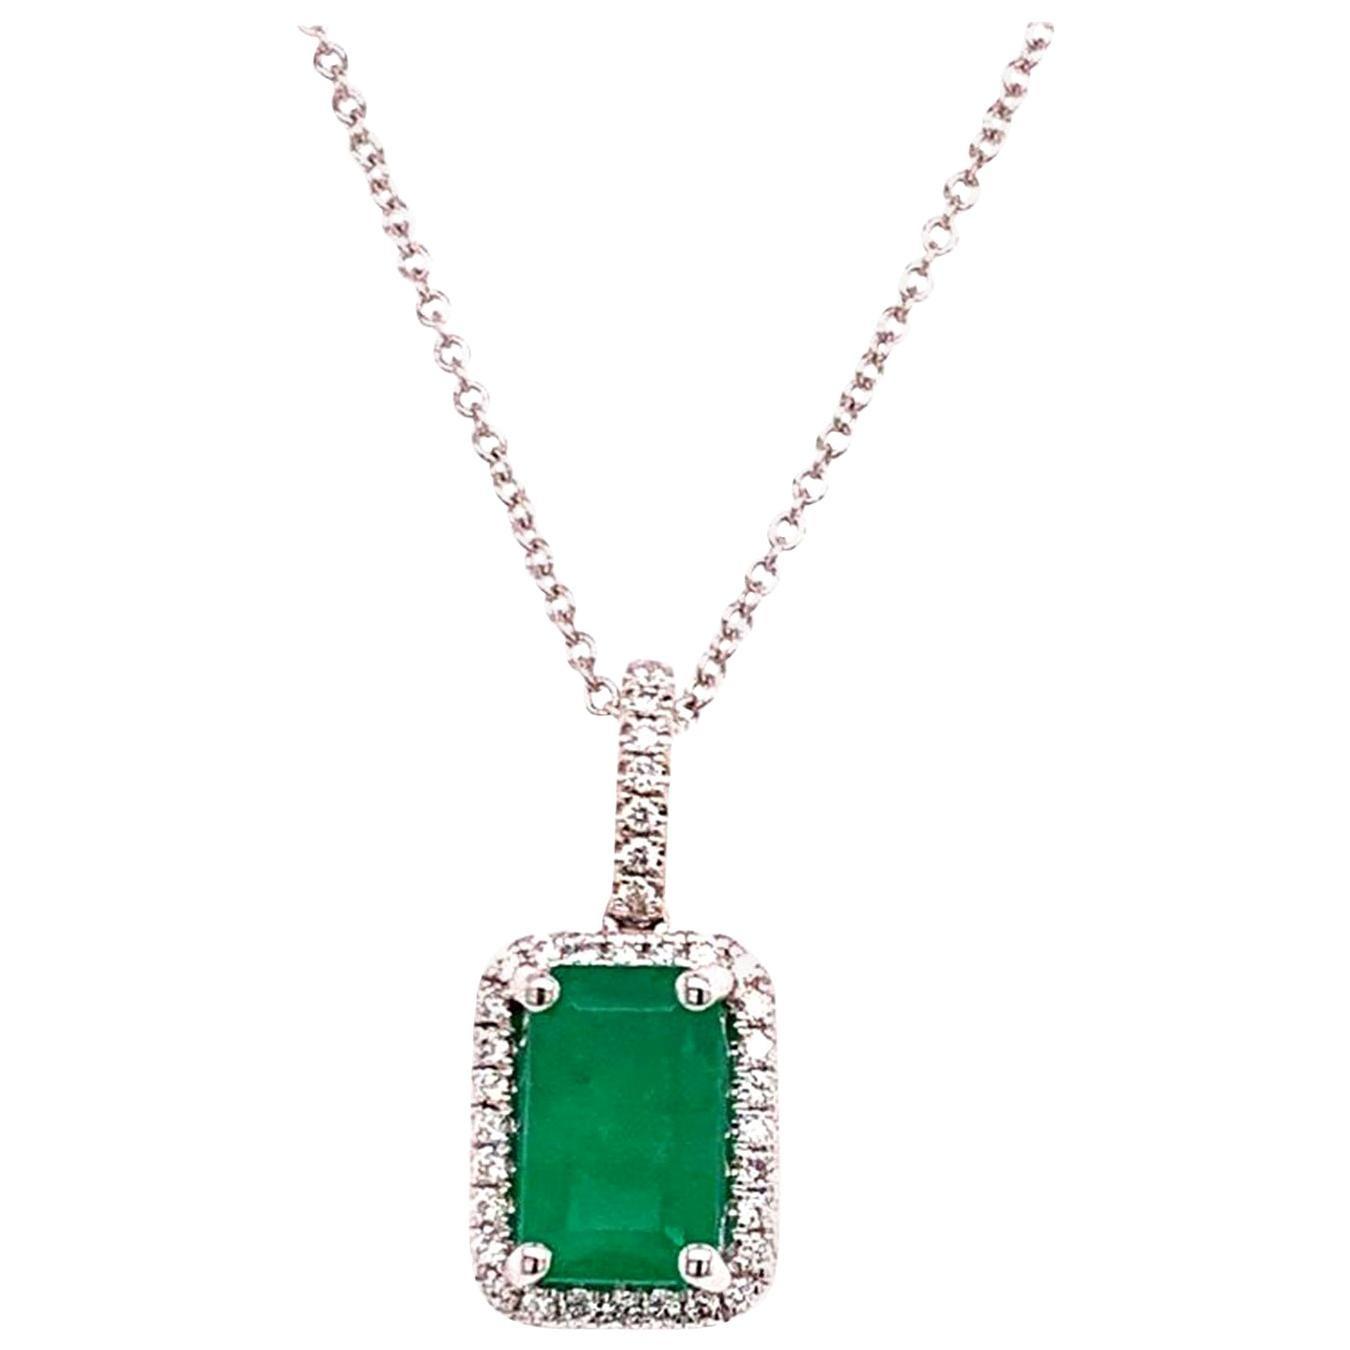 Emerald Diamond Necklace 18k Gold 2.55 TCW Women Certified